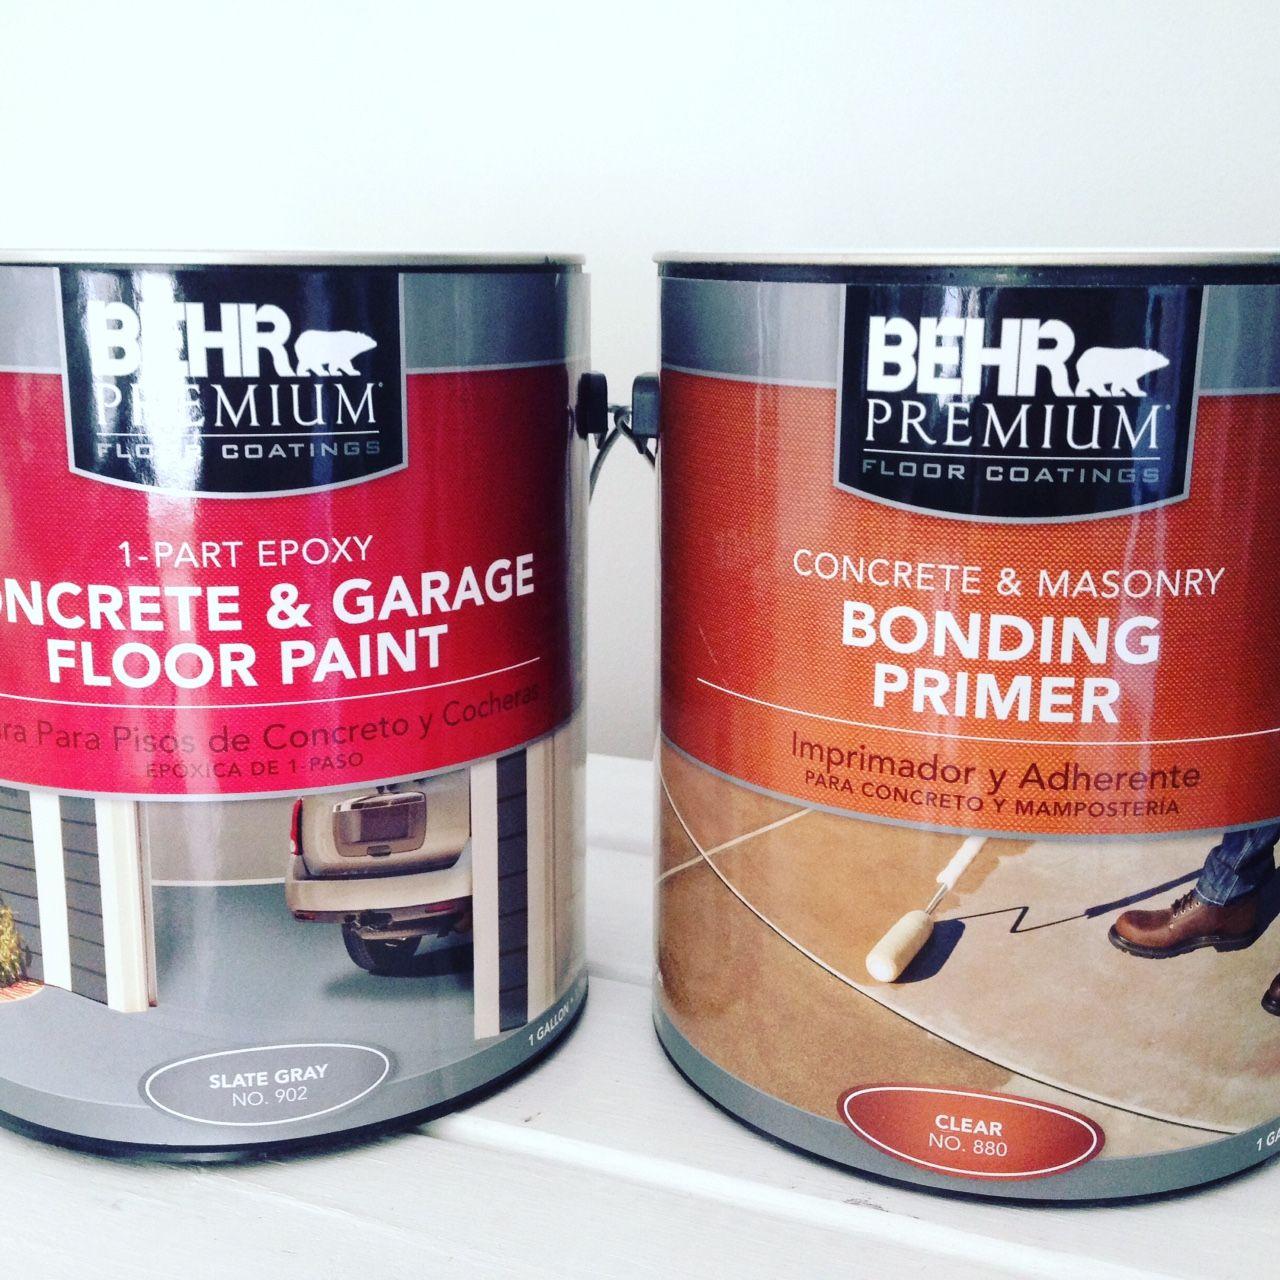 How To Apply Garage Floor Paint Painted Floors Garage Floor Paint Flooring